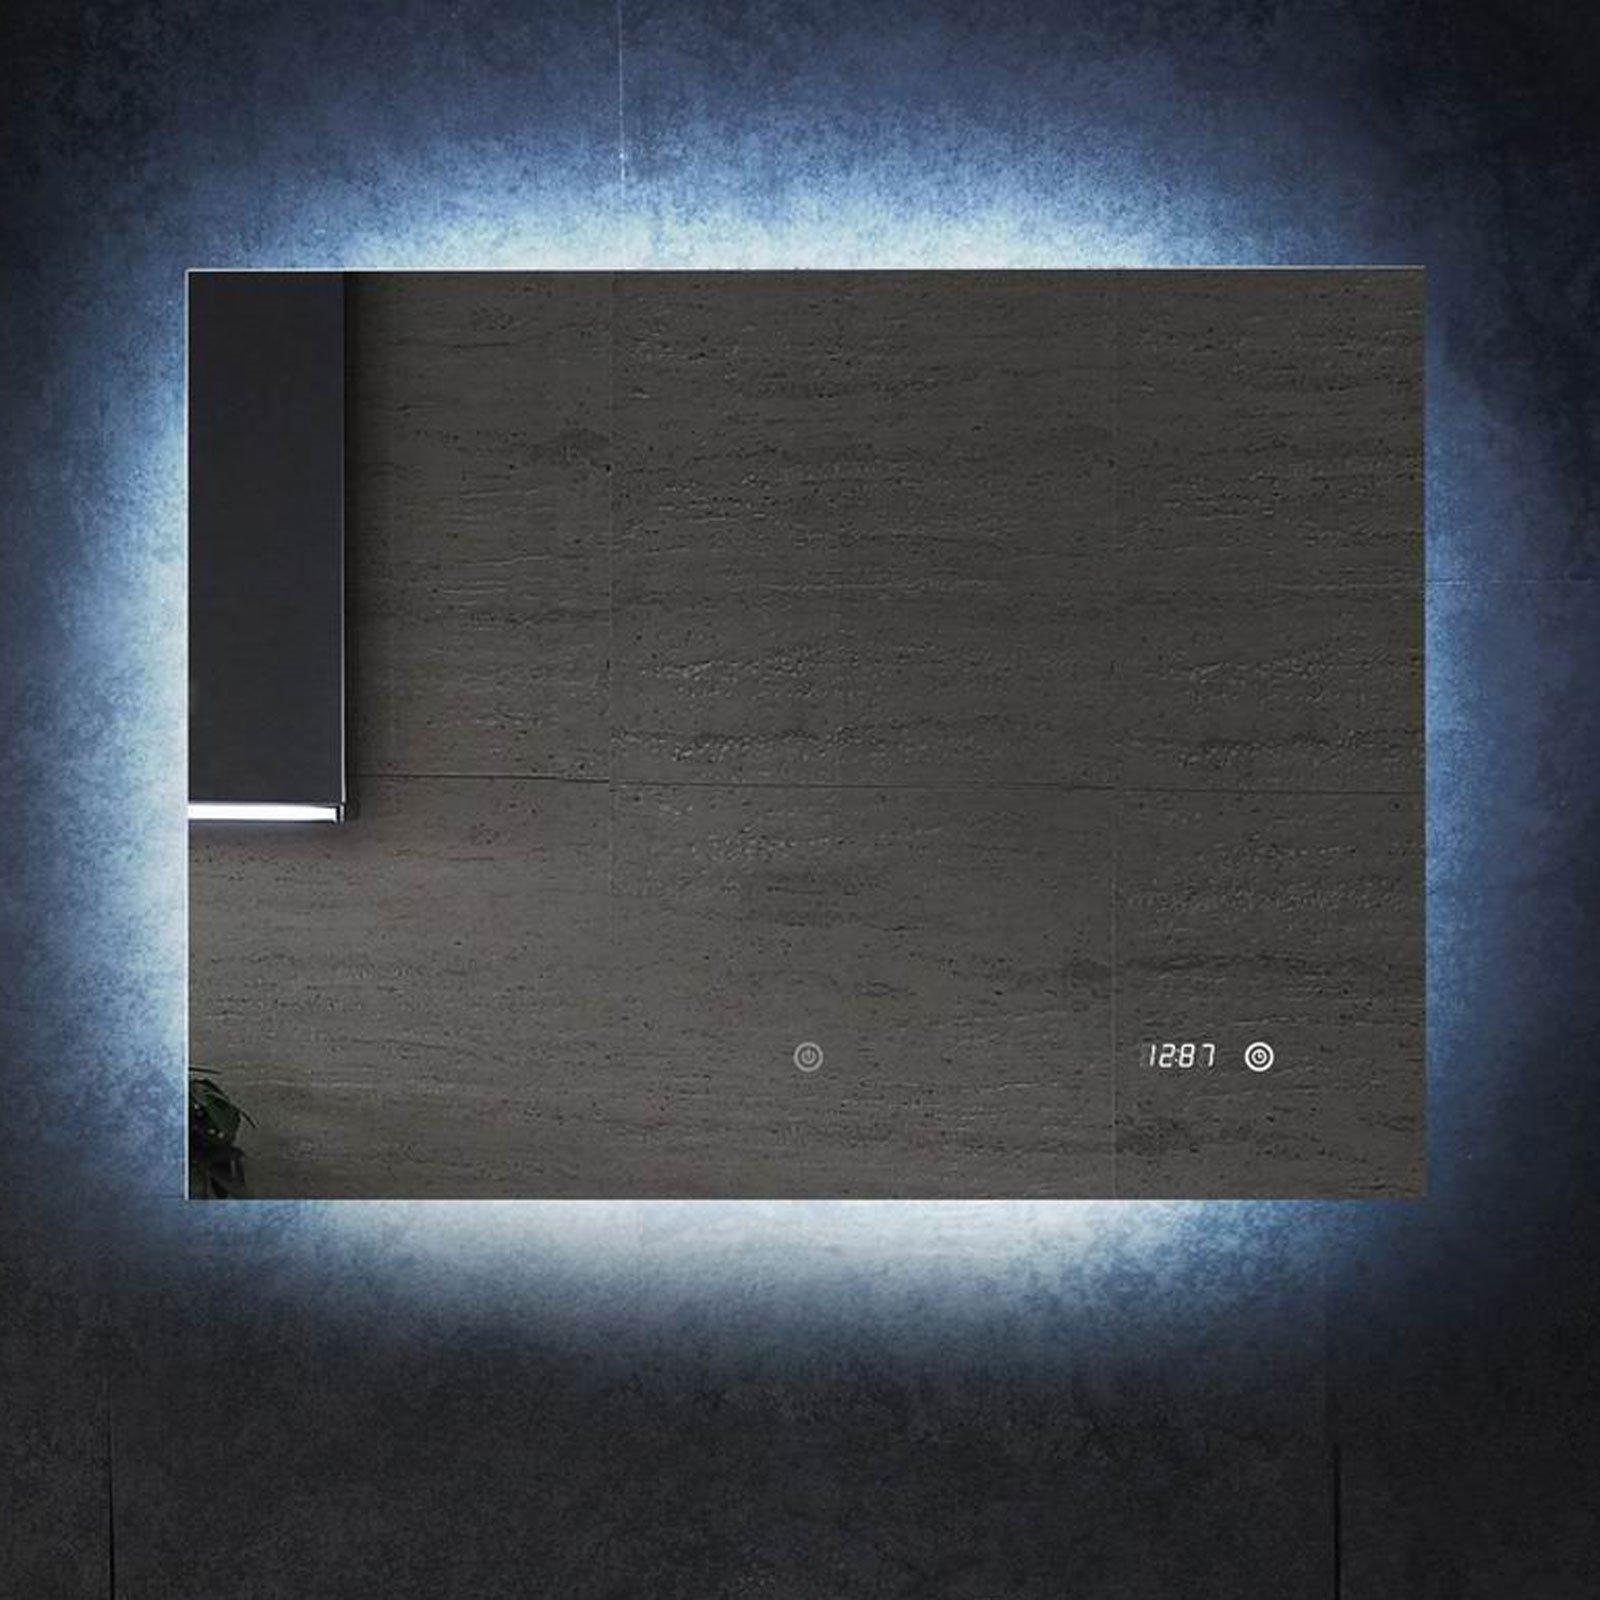 badspiegel 80x60cm mit led beleuchtung uhr spiegel wandspiegel bad. Black Bedroom Furniture Sets. Home Design Ideas